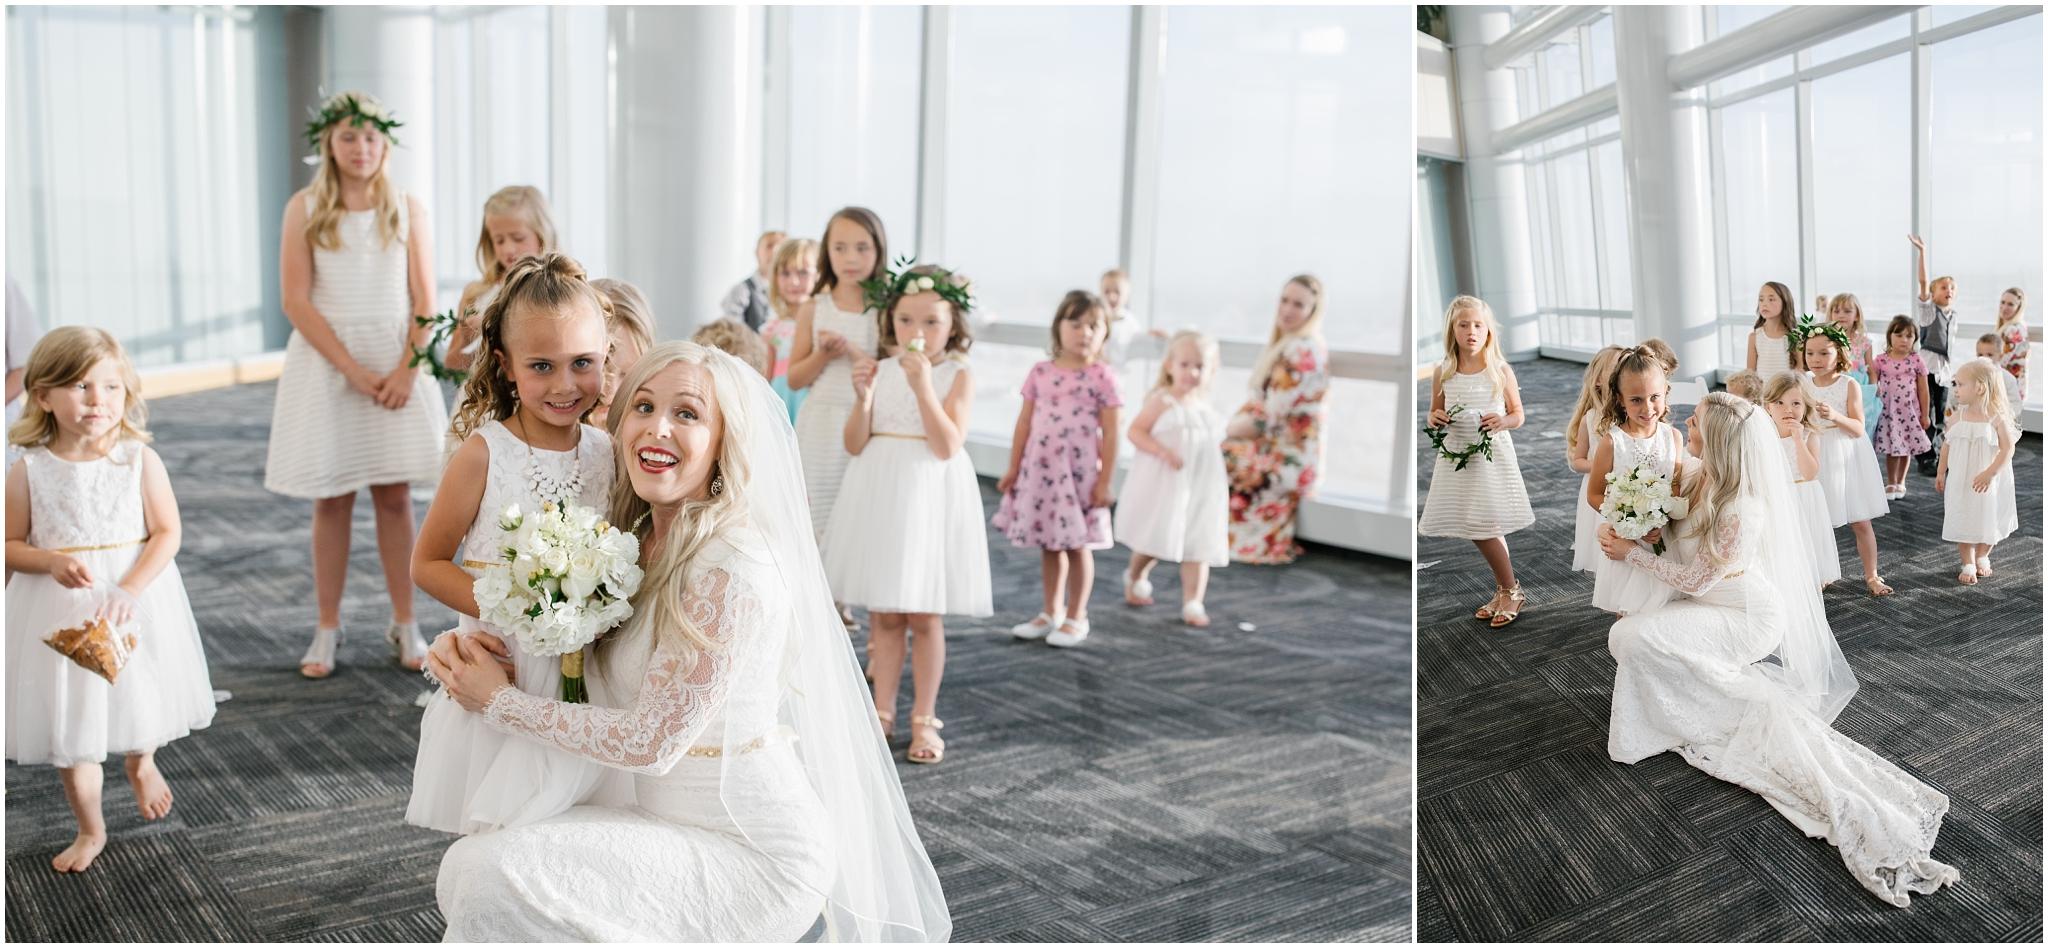 CherylandTyler-549_Lizzie-B-Imagery-Utah-Wedding-Photographer-Salt-Lake-City-Temple-Wells-Fargo-Building-Reception.jpg